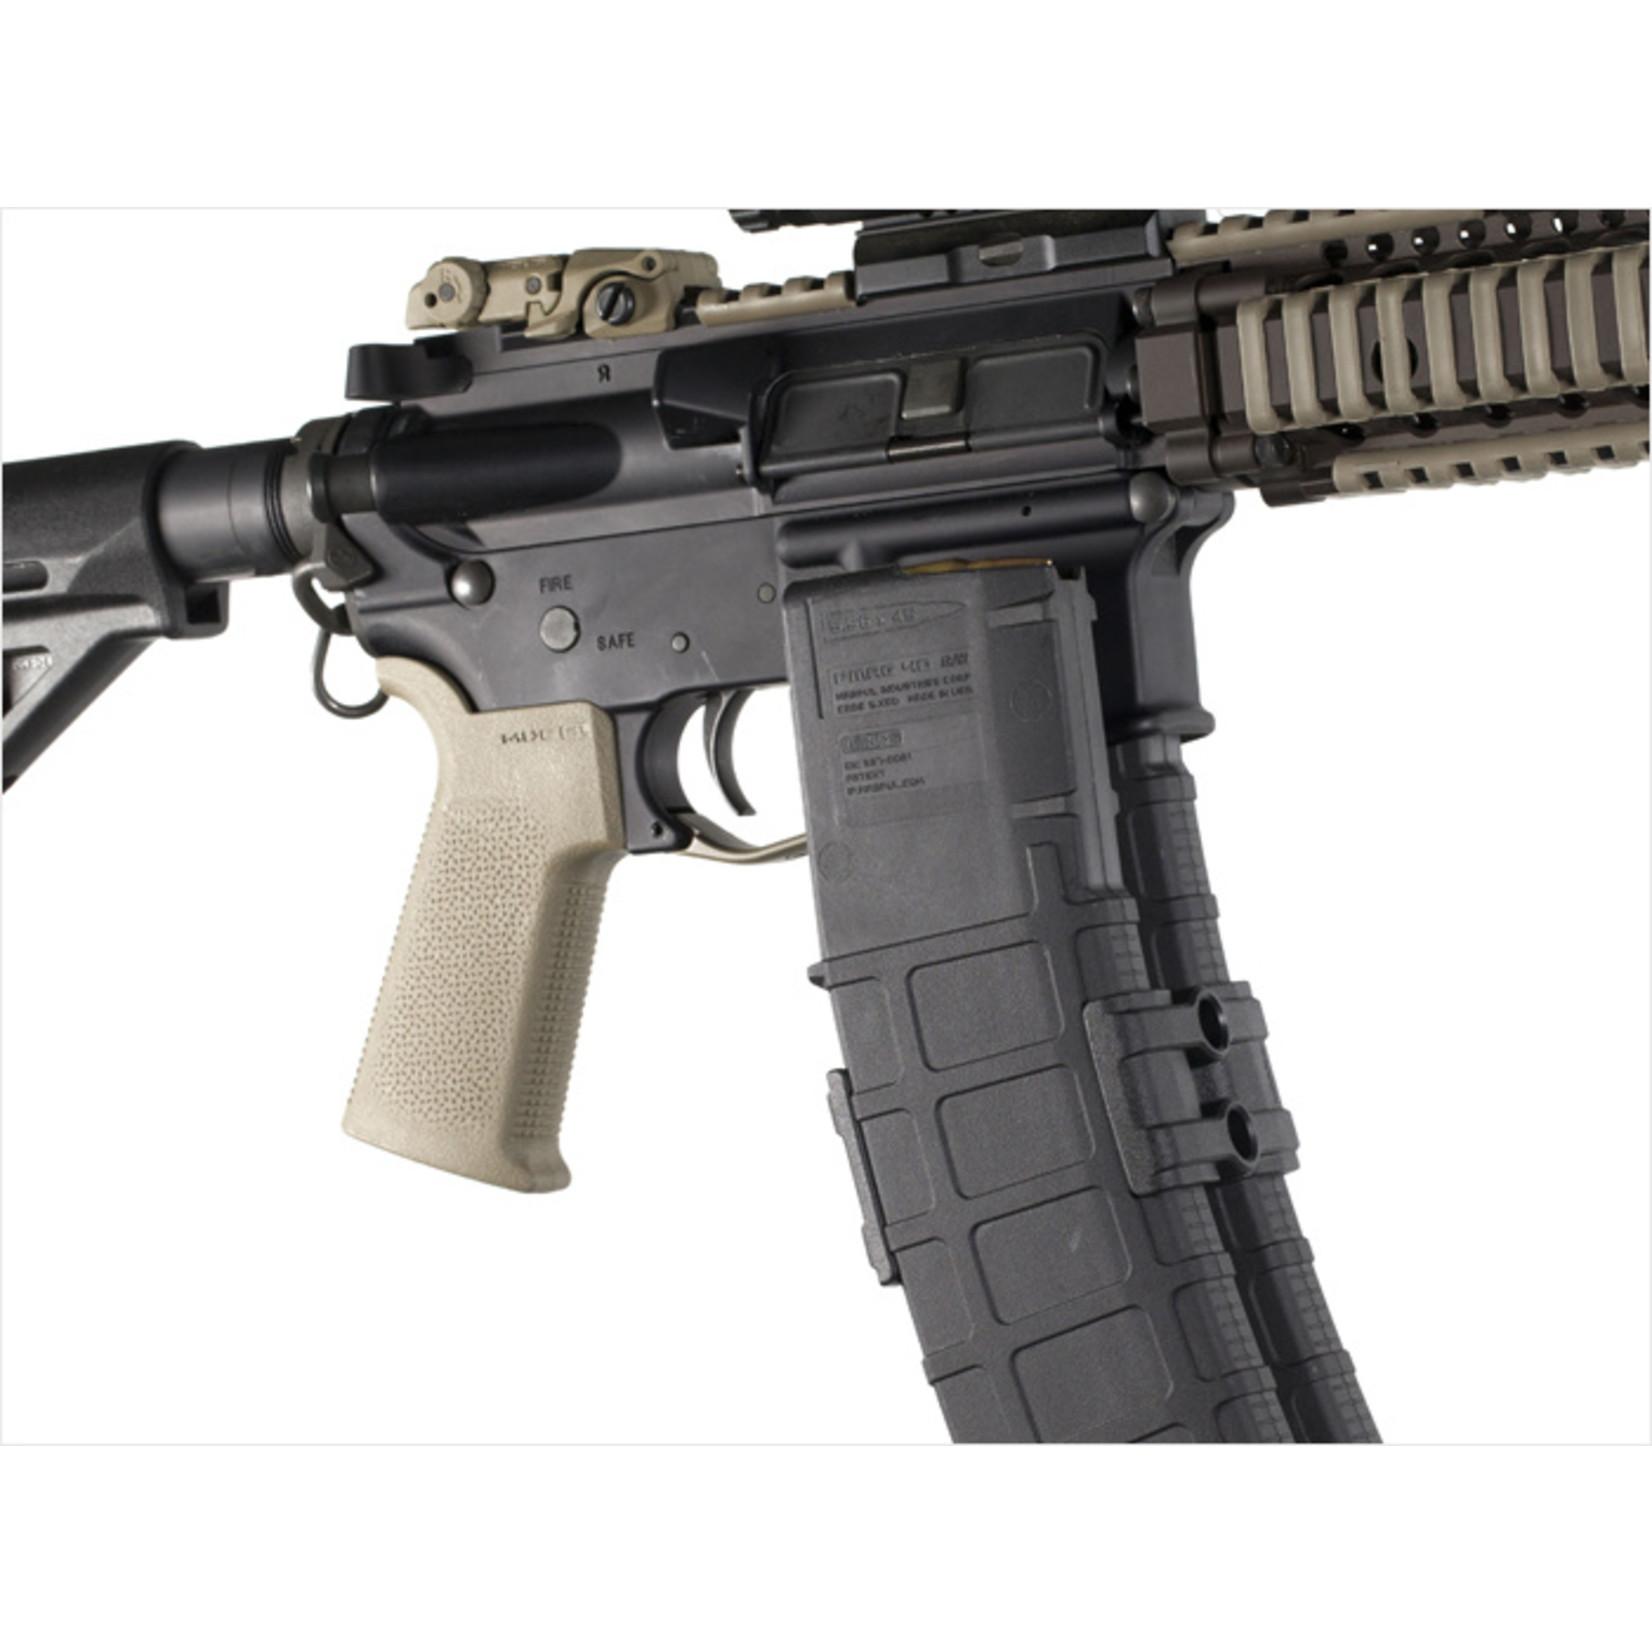 MAGPUL MAGLINK COUPLER - PMAG 30/40 AR/M4